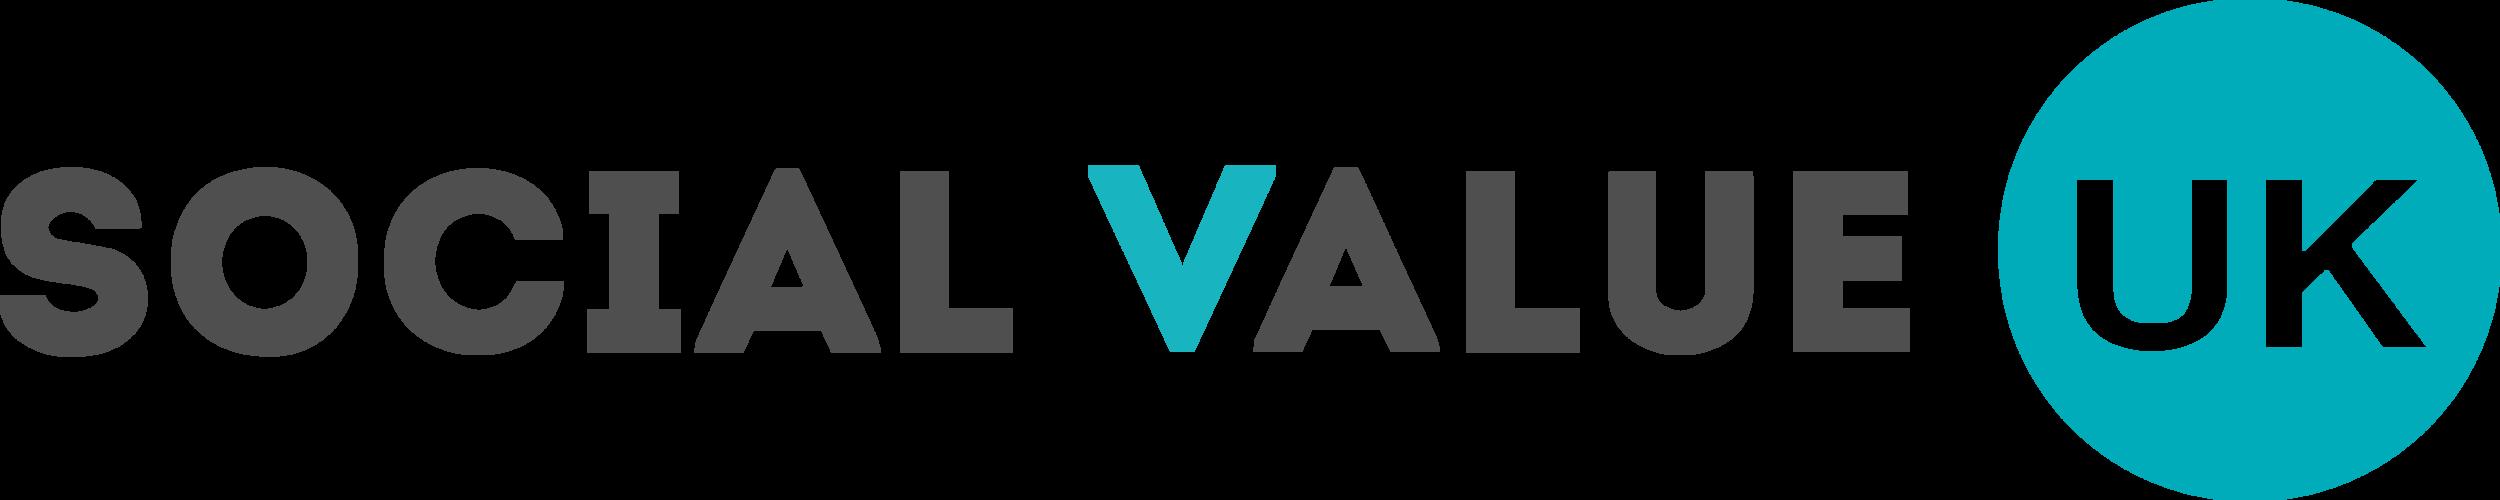 Social Value UK_Grey CYMK Logo (1).png